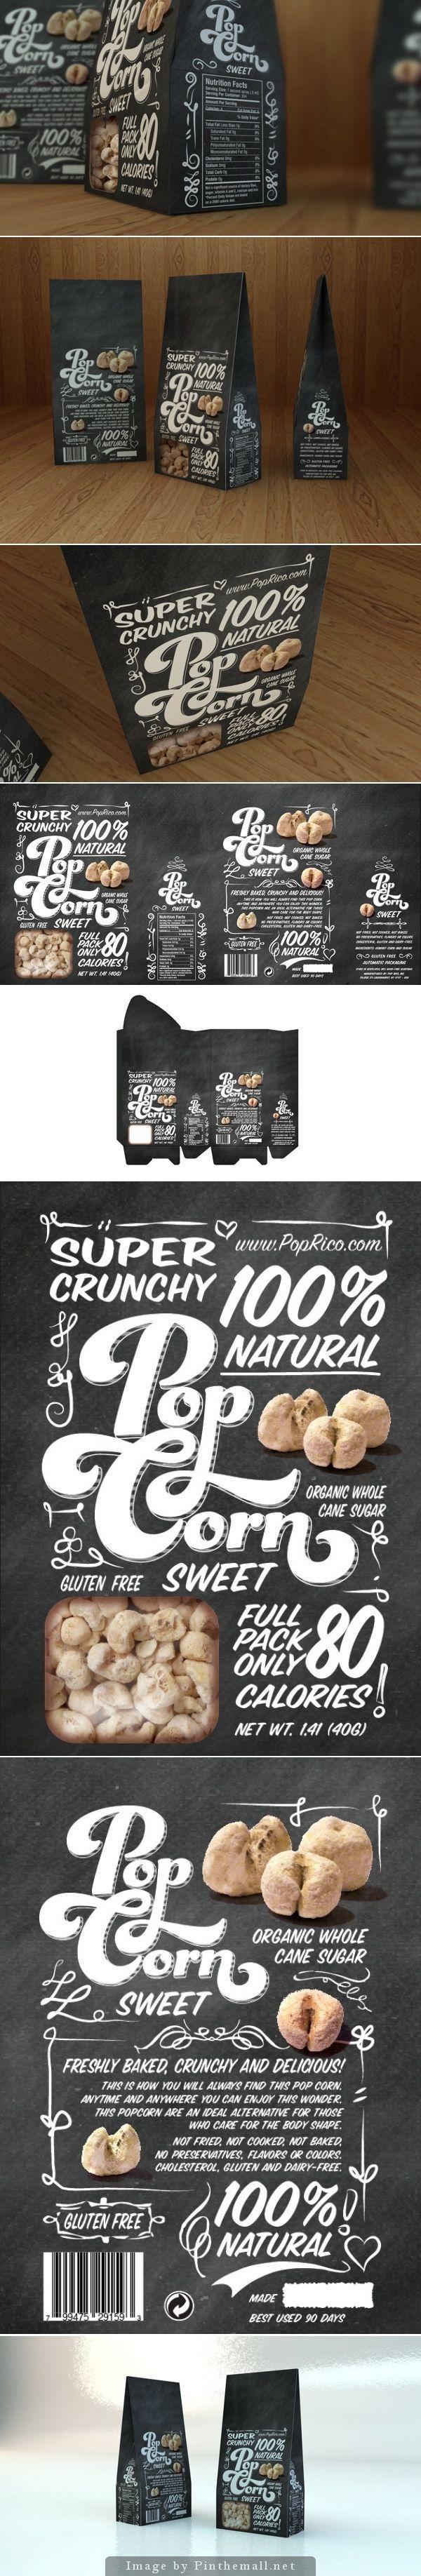 Sweet Popcorn #packaging PD: